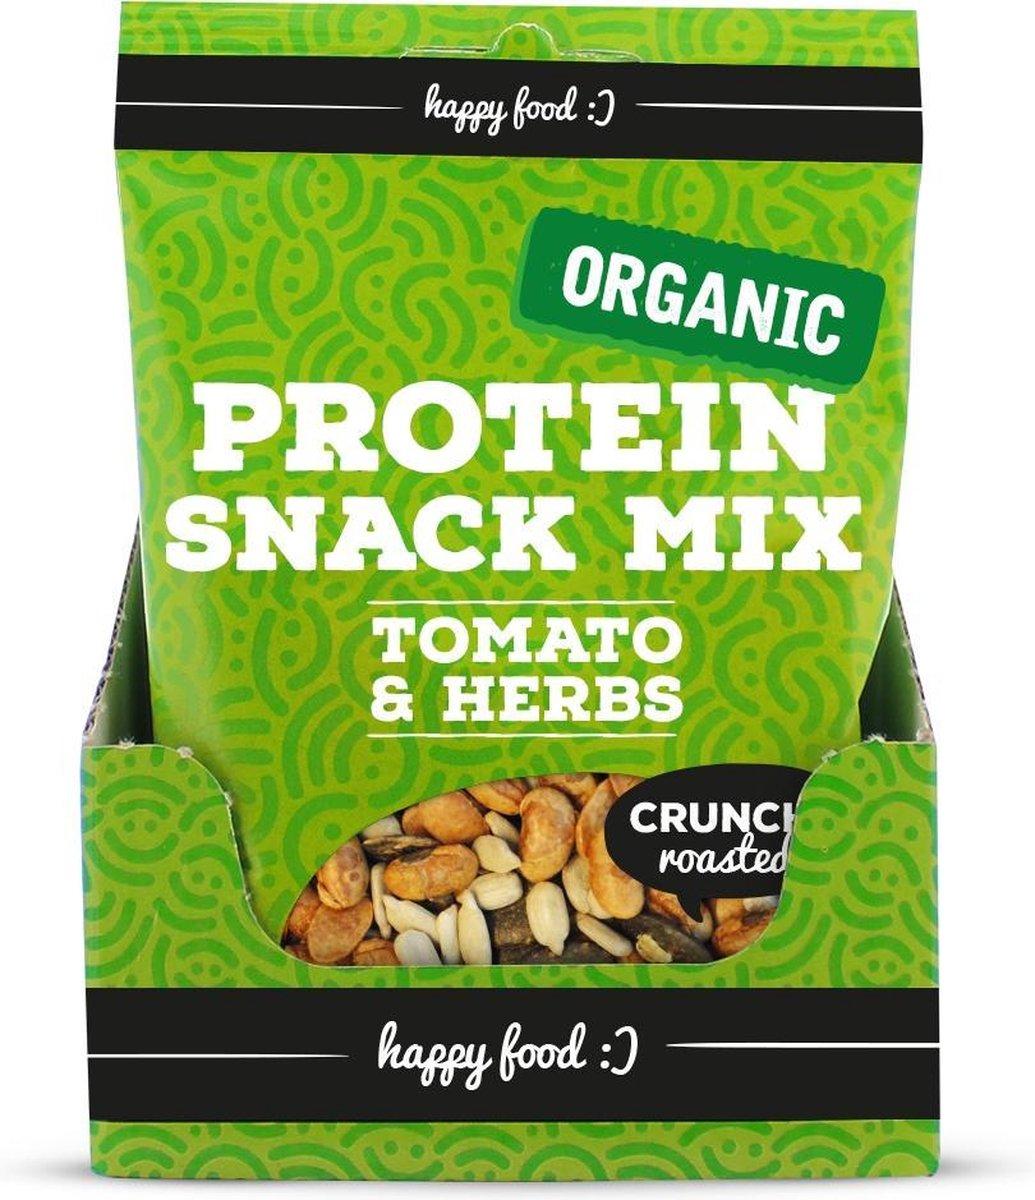 Body & Fit Organic Protein Snack Mix Bio - 1 zakje - Tomato & Herbs - Body & Fit Organic